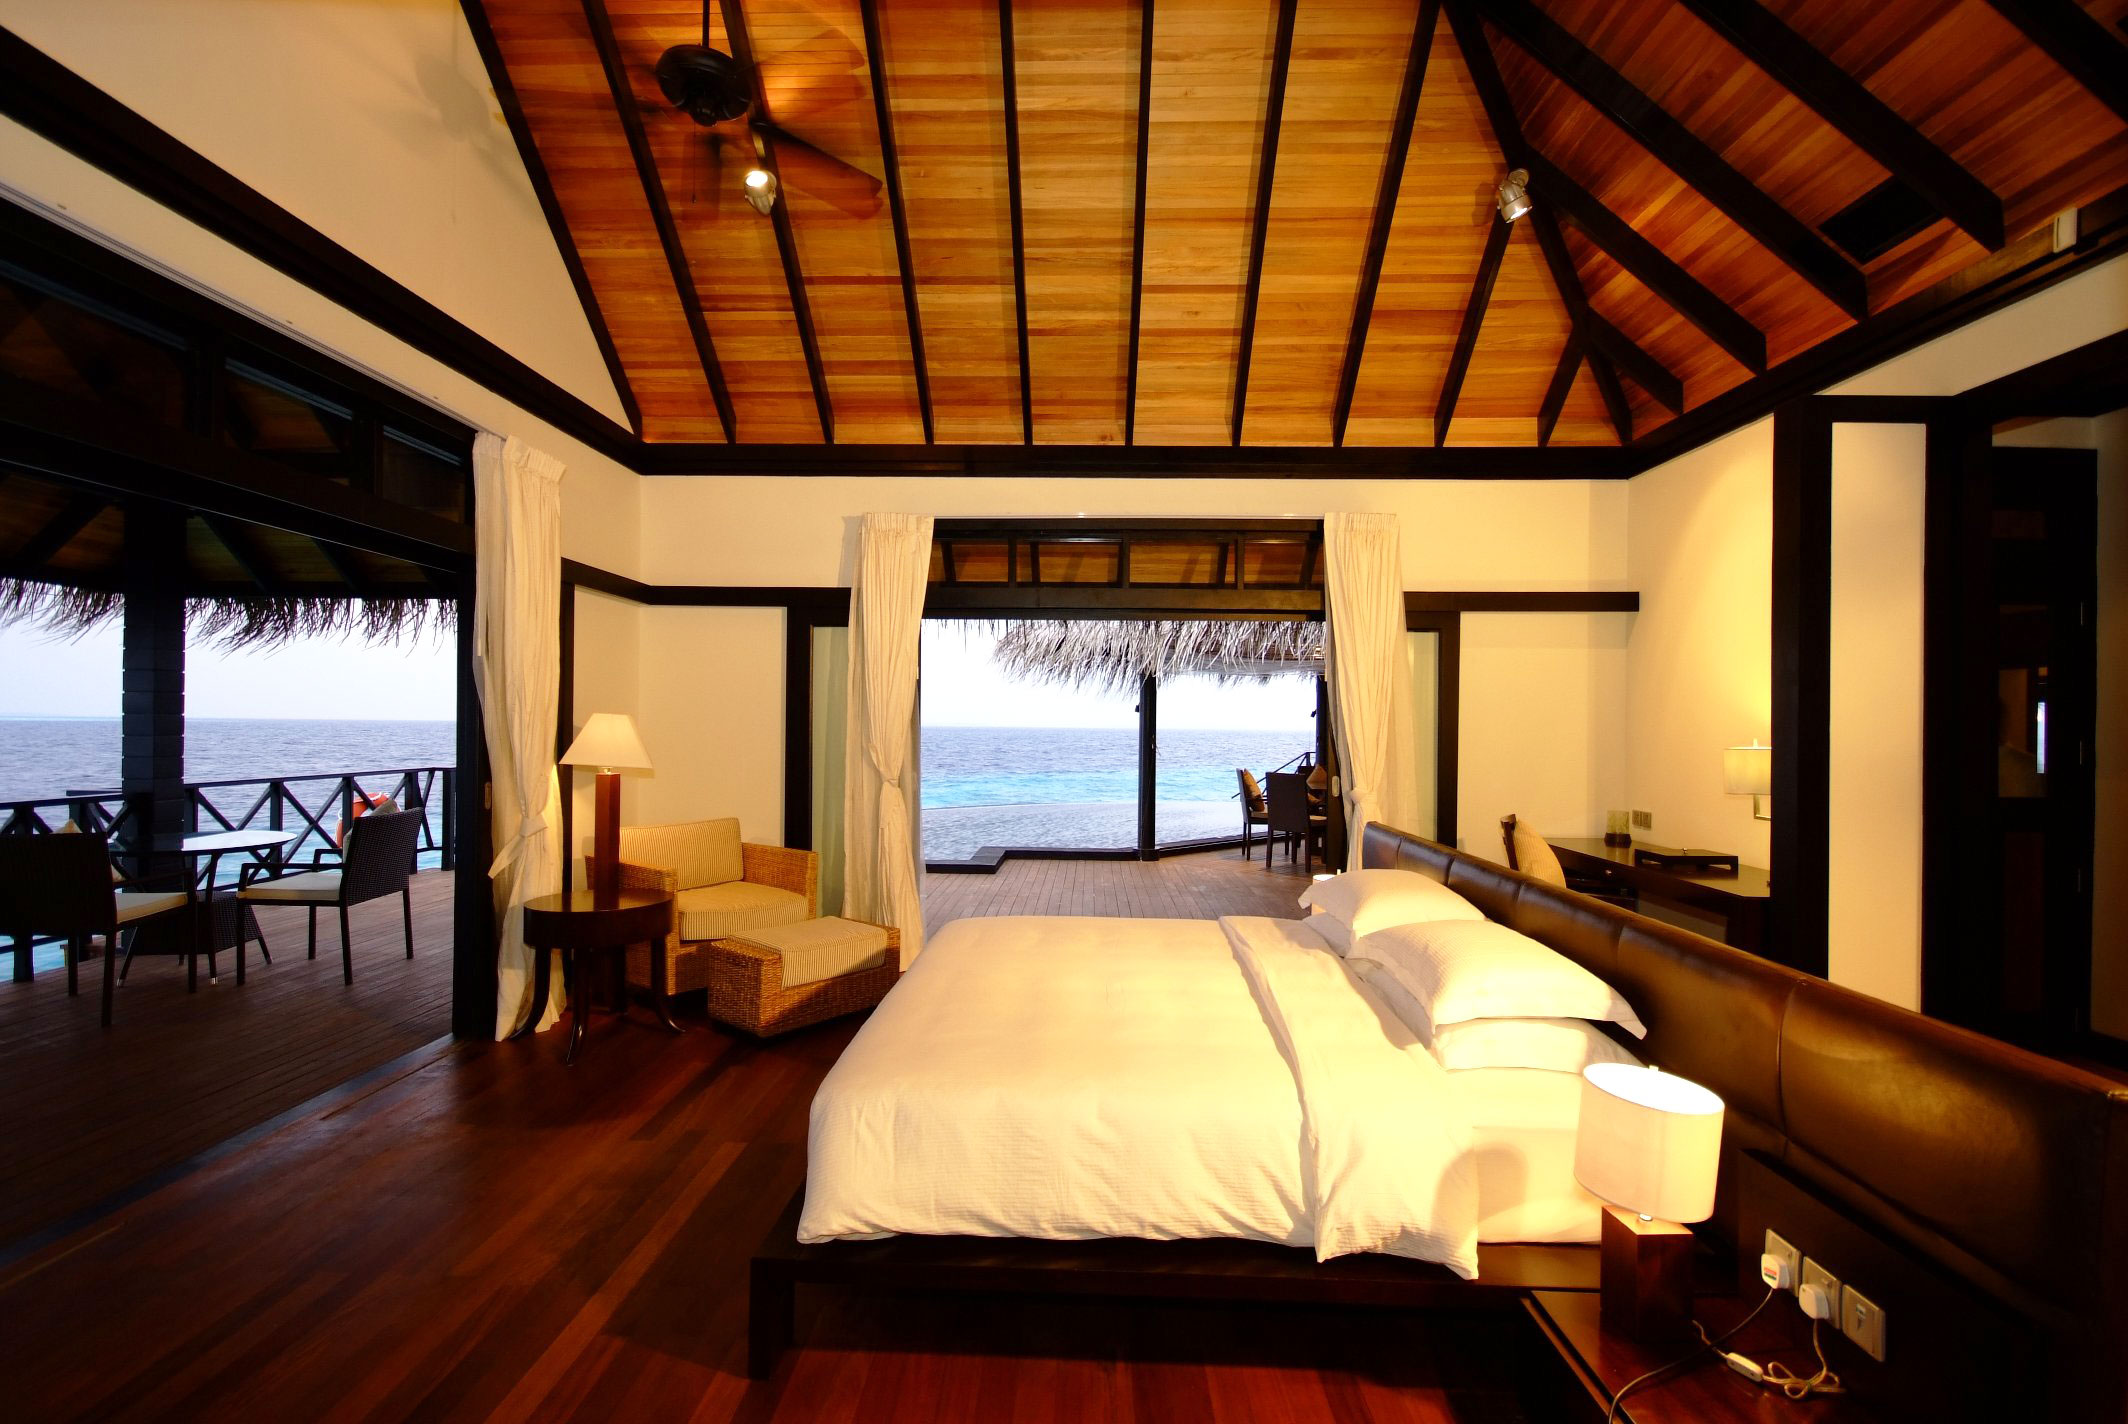 Iruveli A Serene Beach House In Maldives Architecture Amp Design